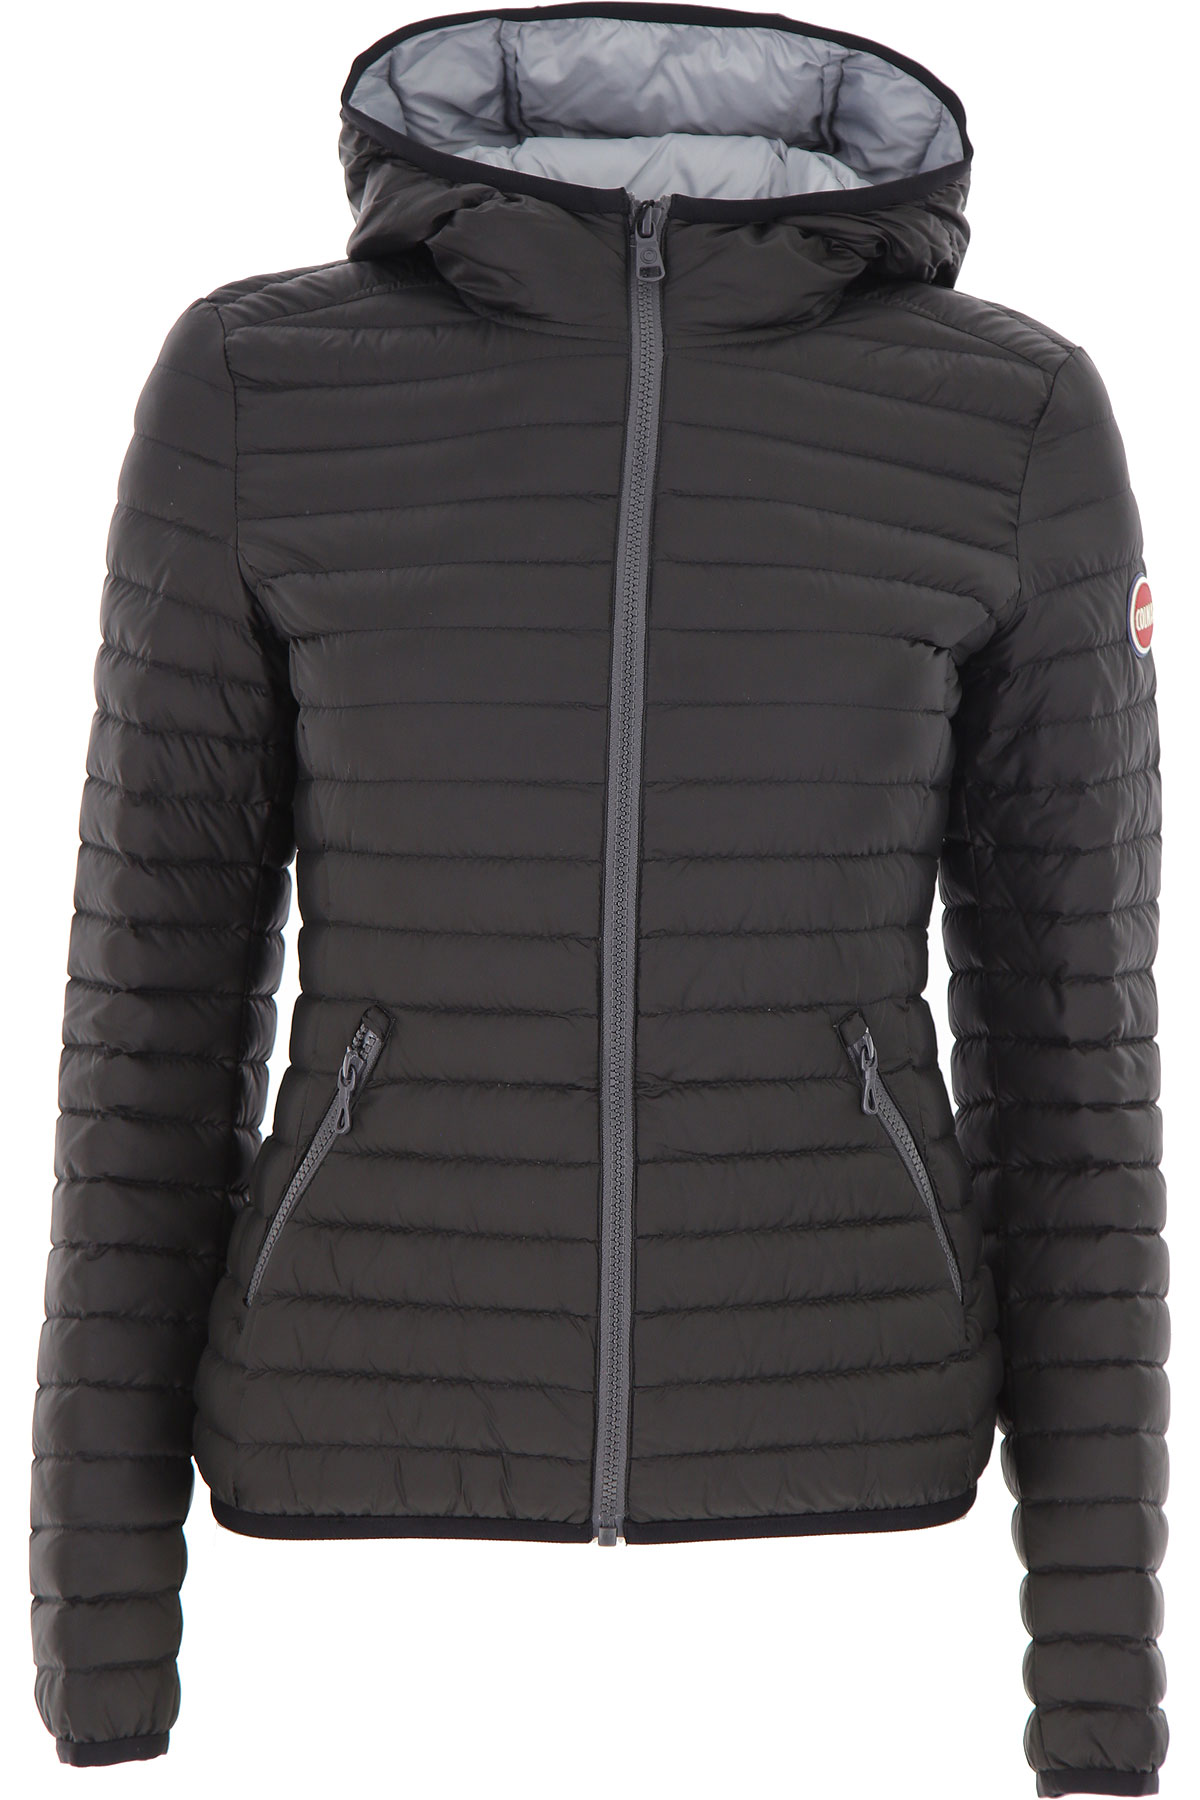 Colmar Down Jacket for Women, Puffer Ski Jacket On Sale, Black, Down, 2019, 10 2 4 6 8